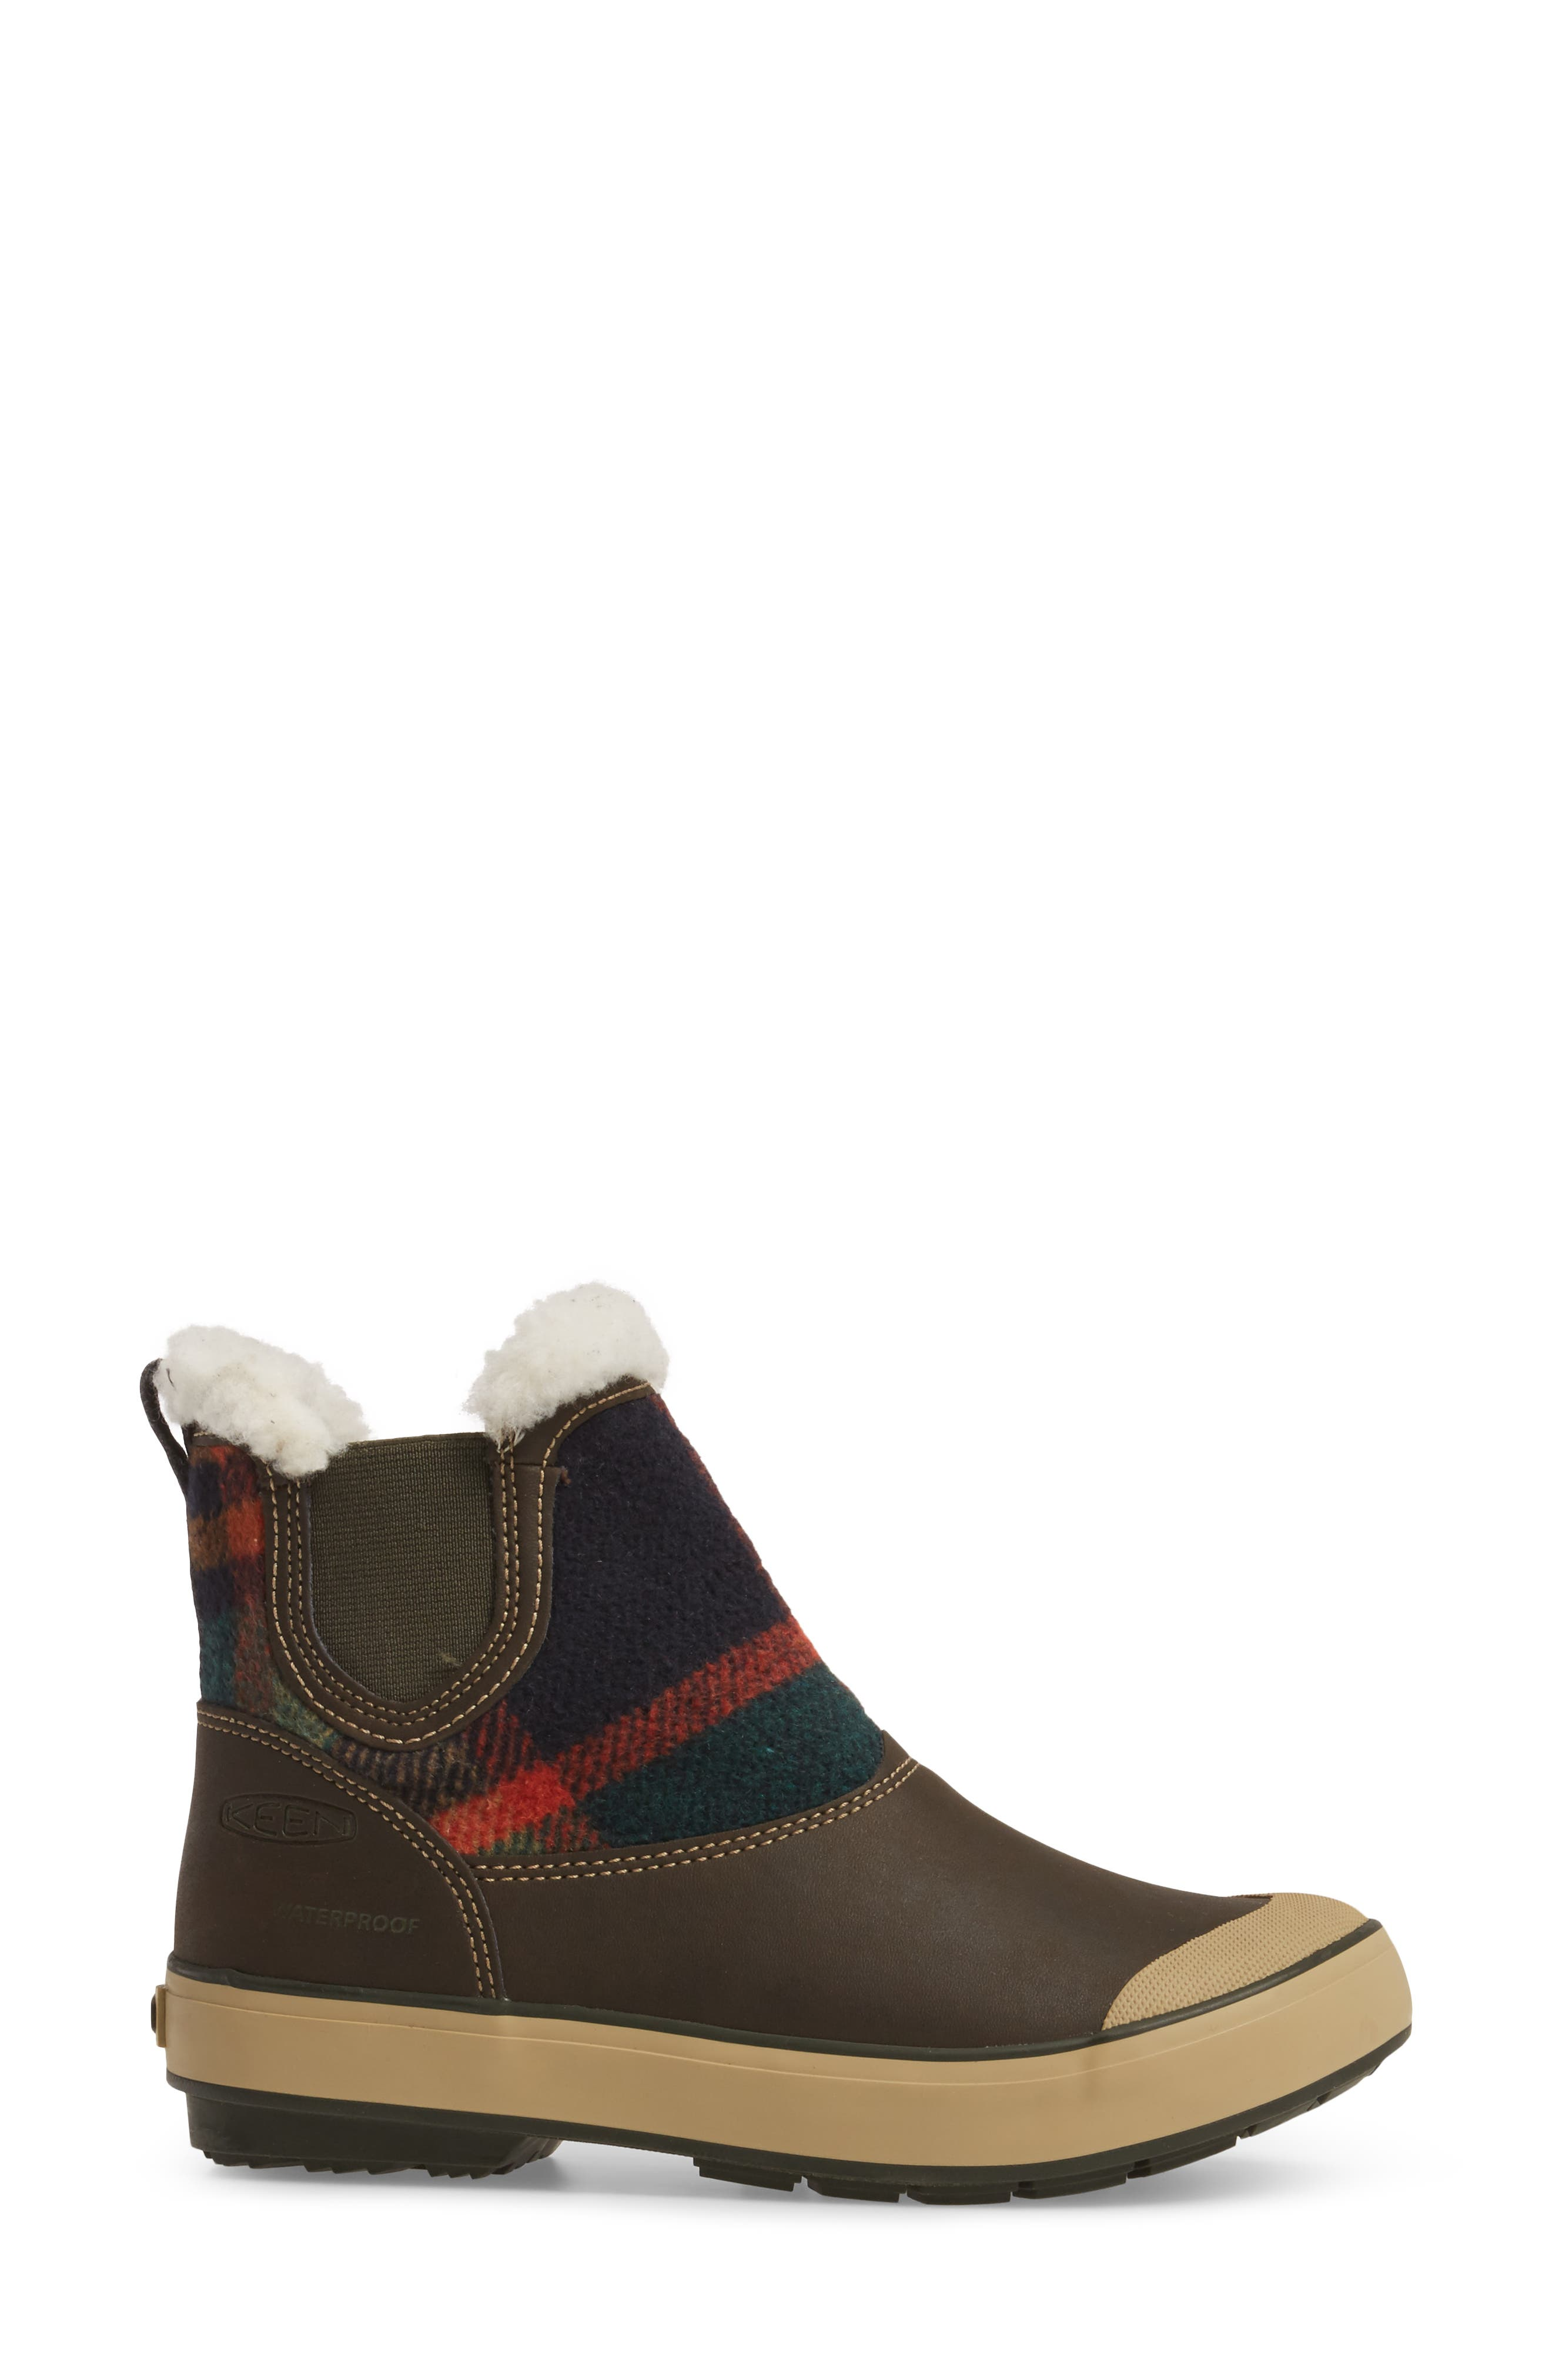 Elsa Chelsea Waterproof Faux Fur Lined Boot,                             Alternate thumbnail 12, color,